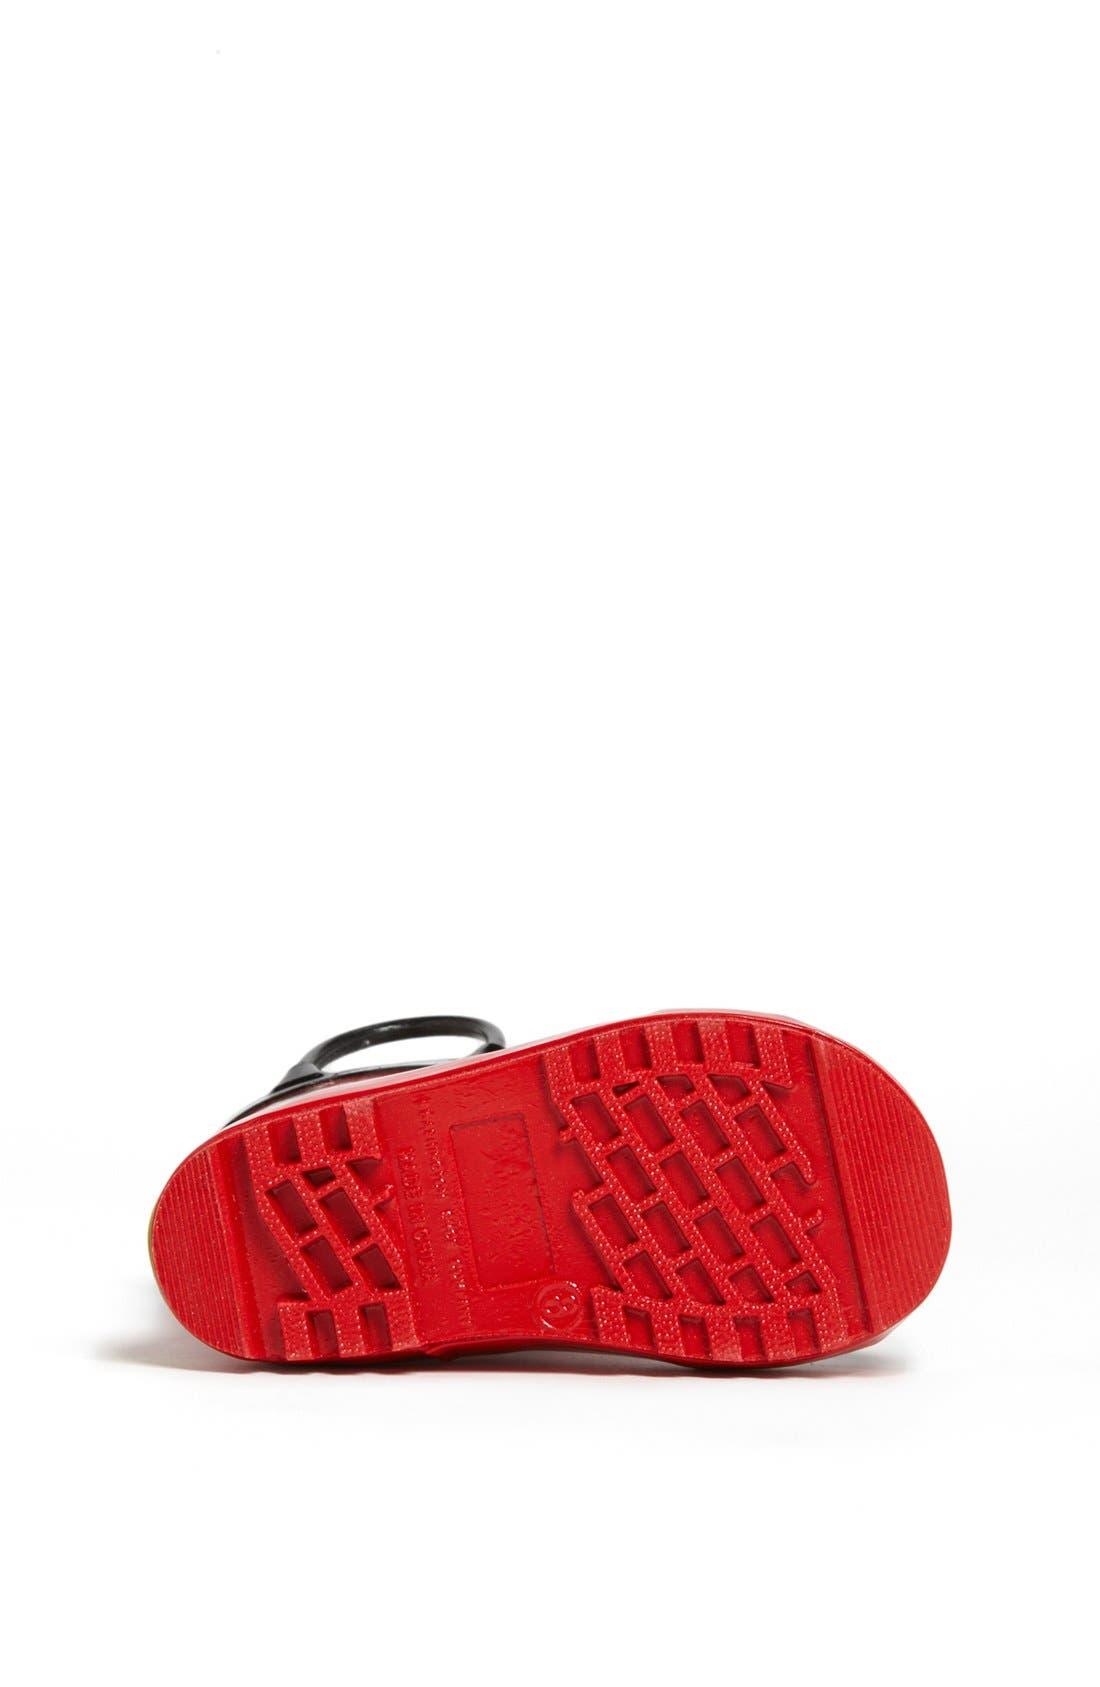 WESTERN CHIEF,                             Ladybug Waterproof Rain Boot,                             Alternate thumbnail 2, color,                             RED